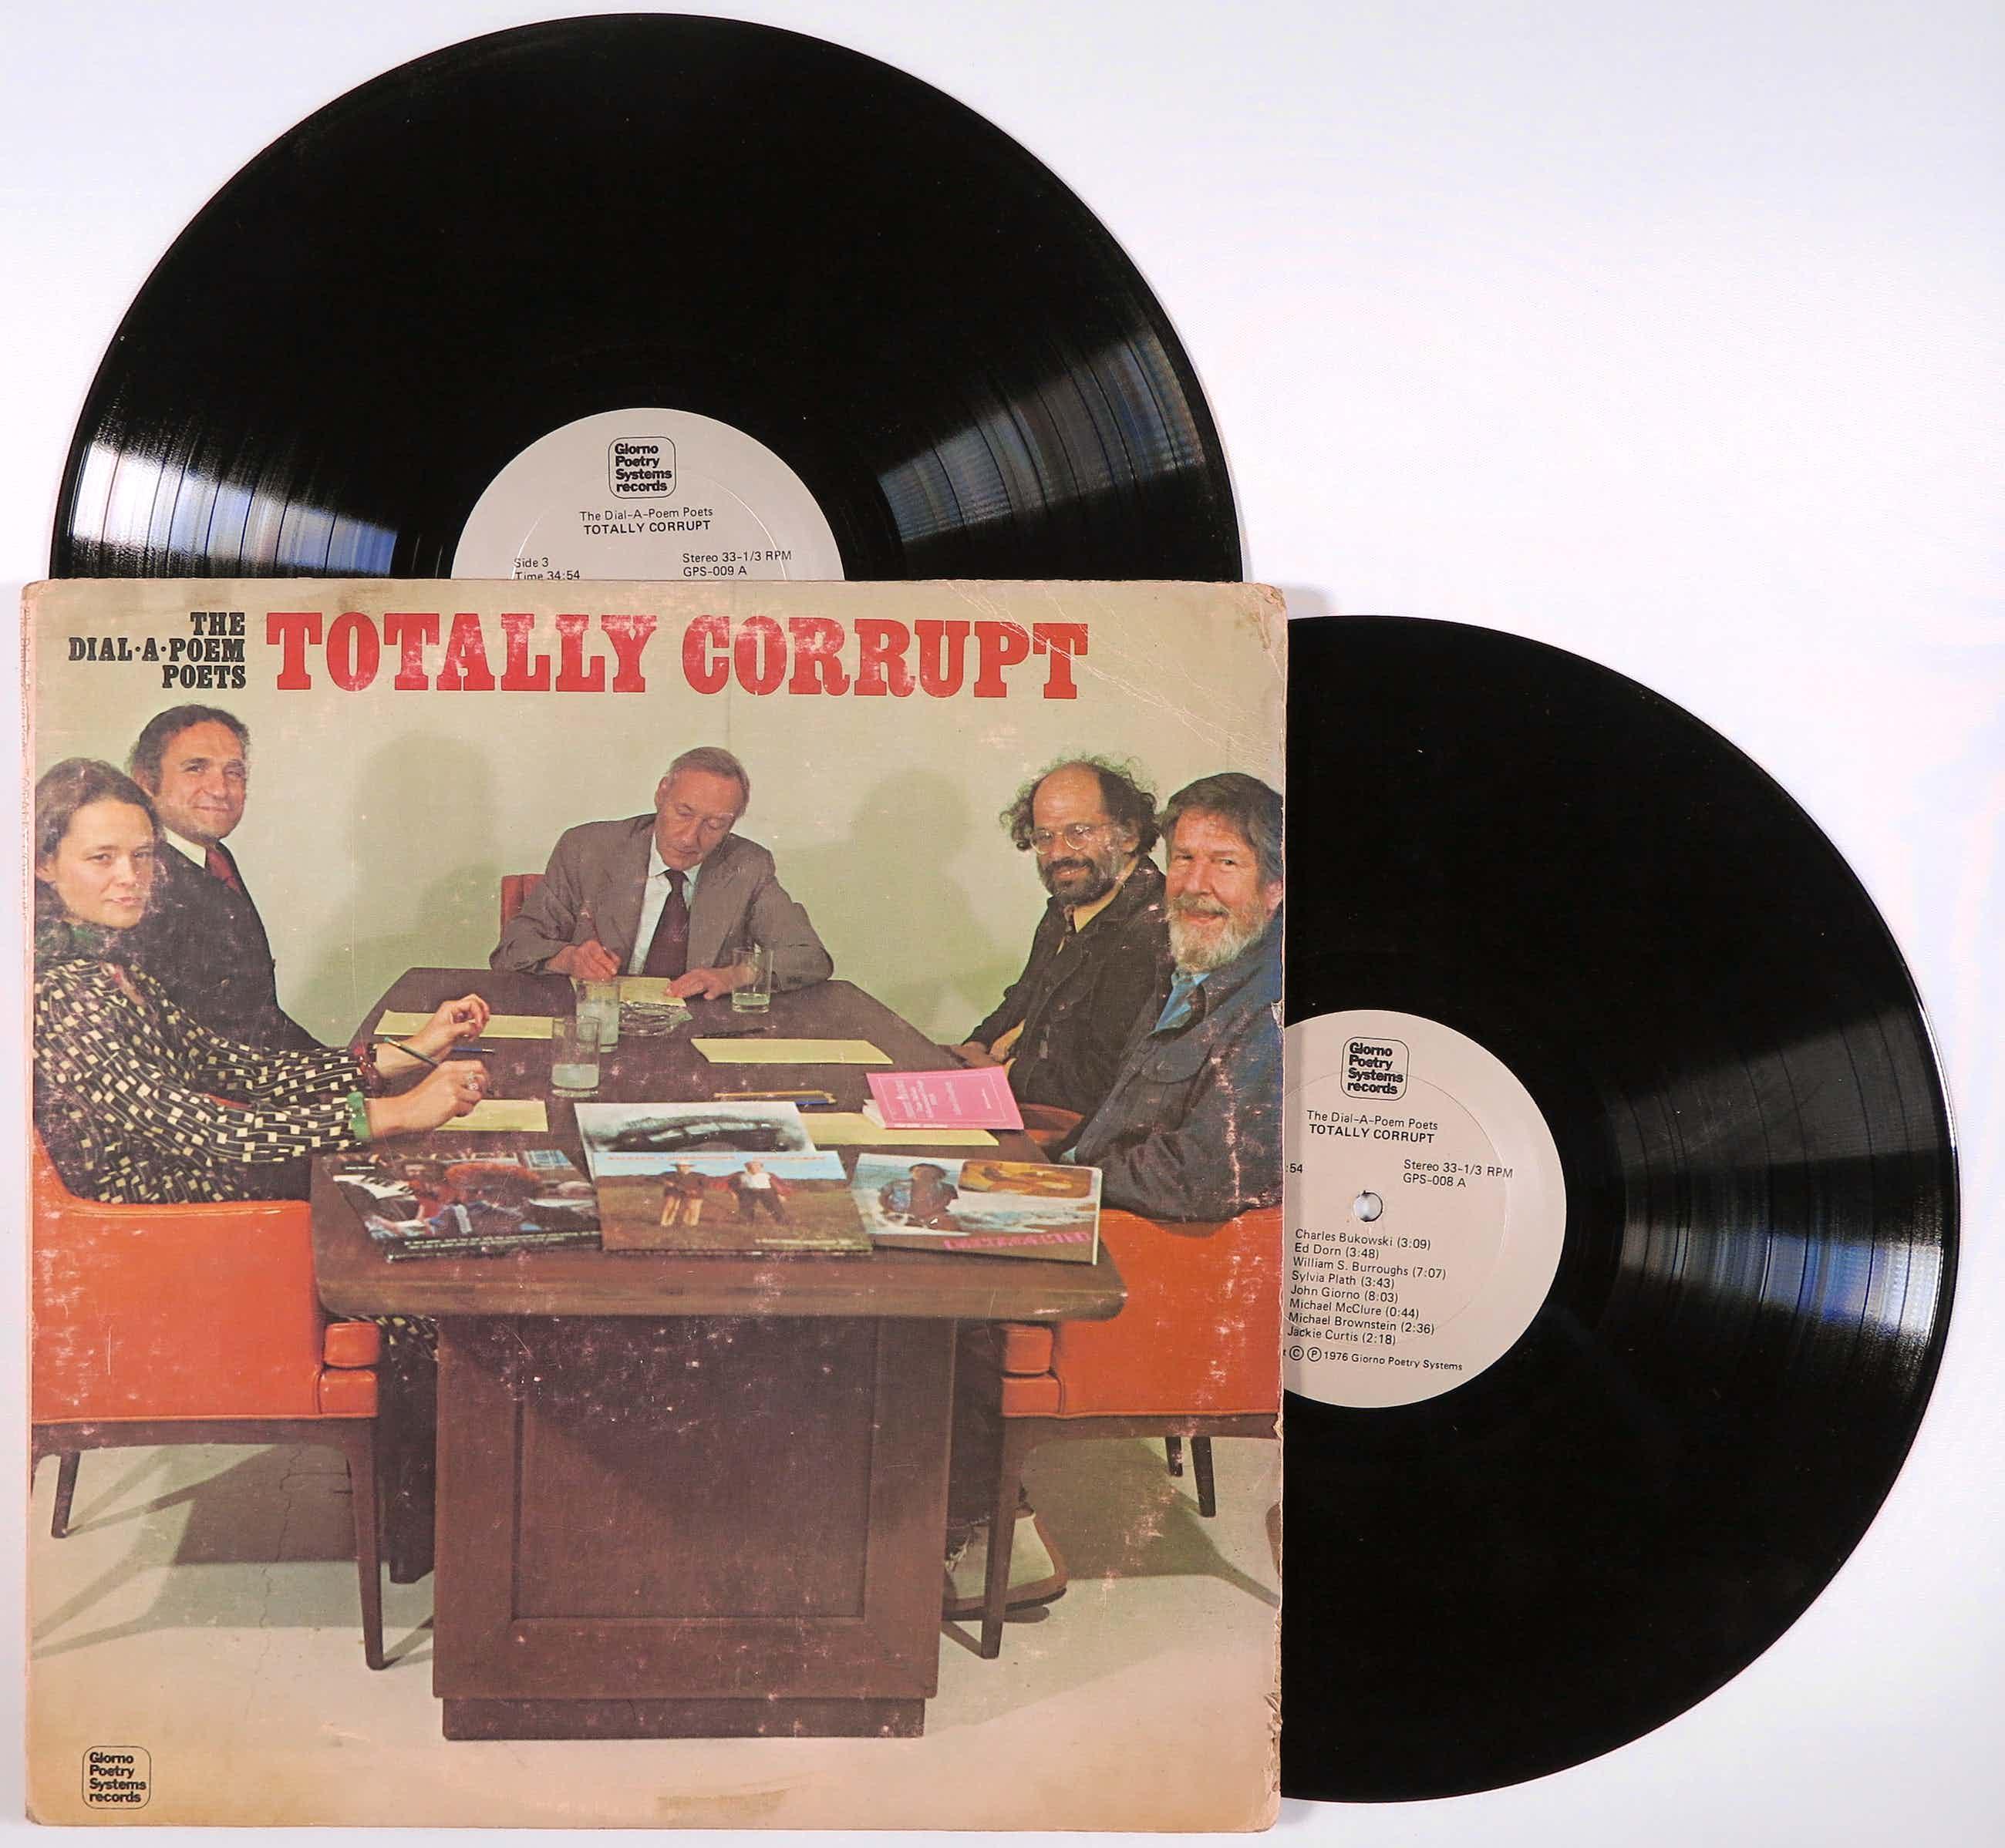 Various artists - 2LP - Totally Corrupt (The Dial-A-Poem Poets) kopen? Bied vanaf 35!